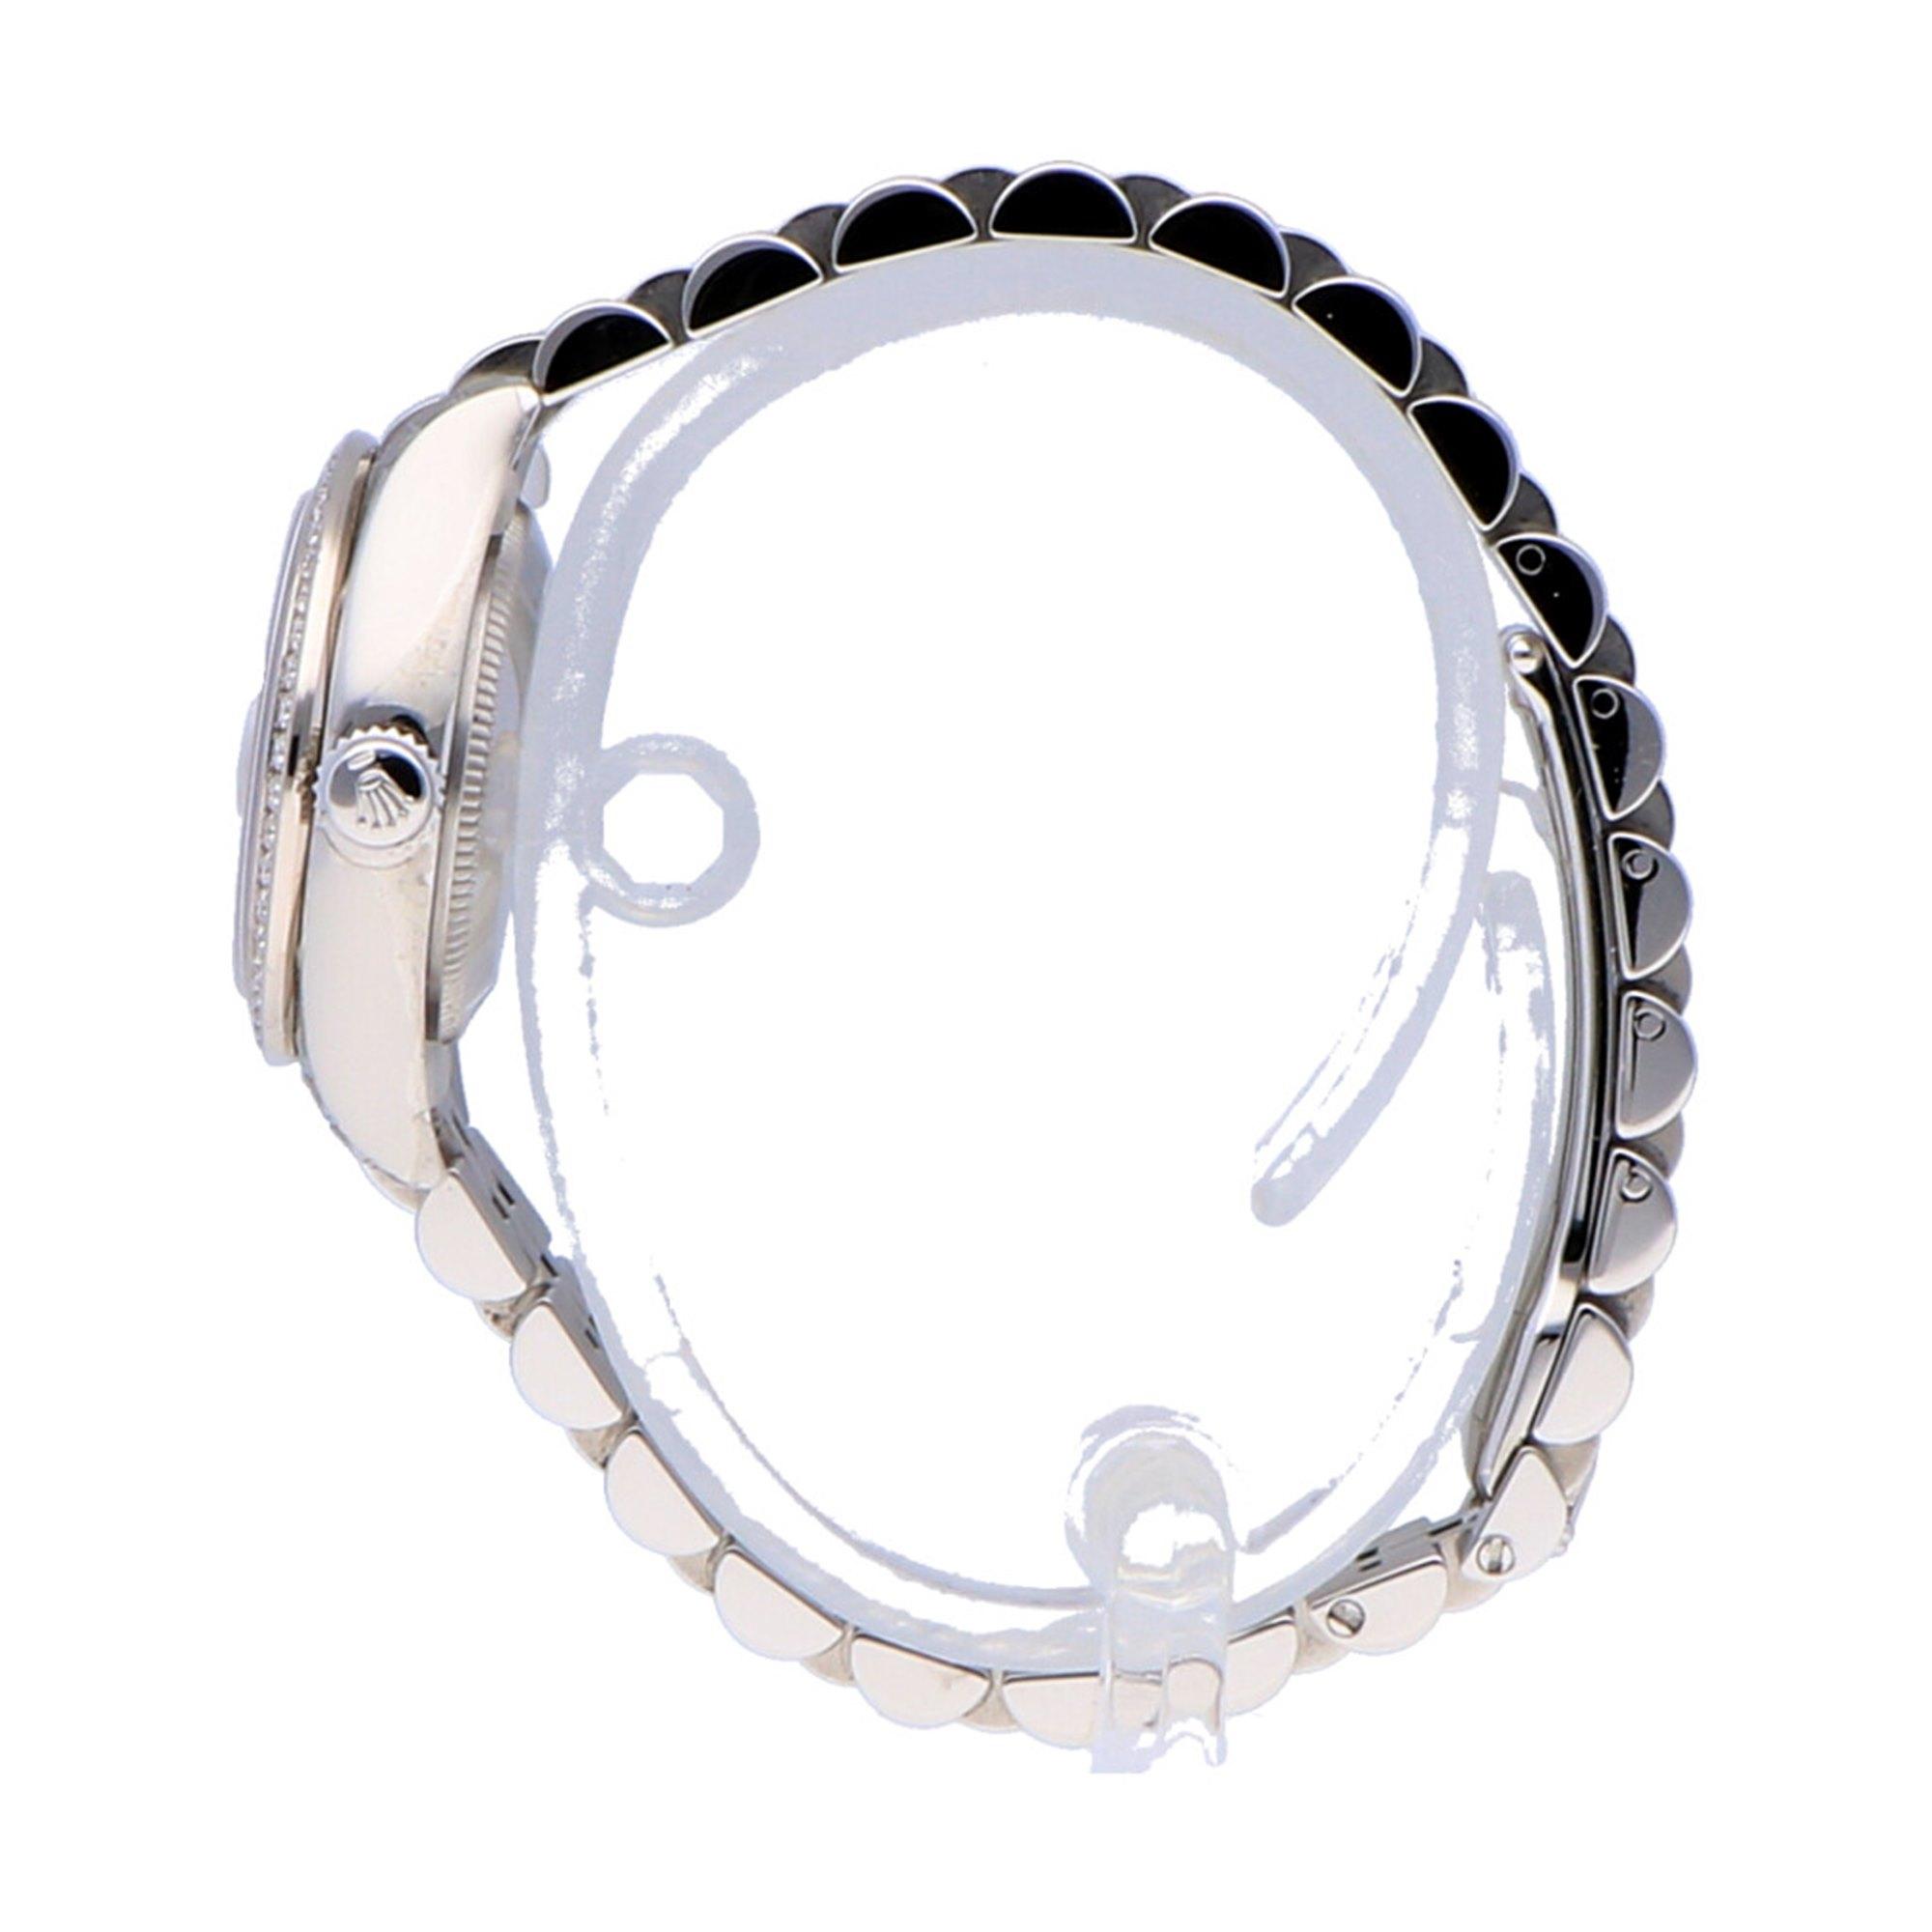 Rolex Datejust Stainless Steel 179384-0021